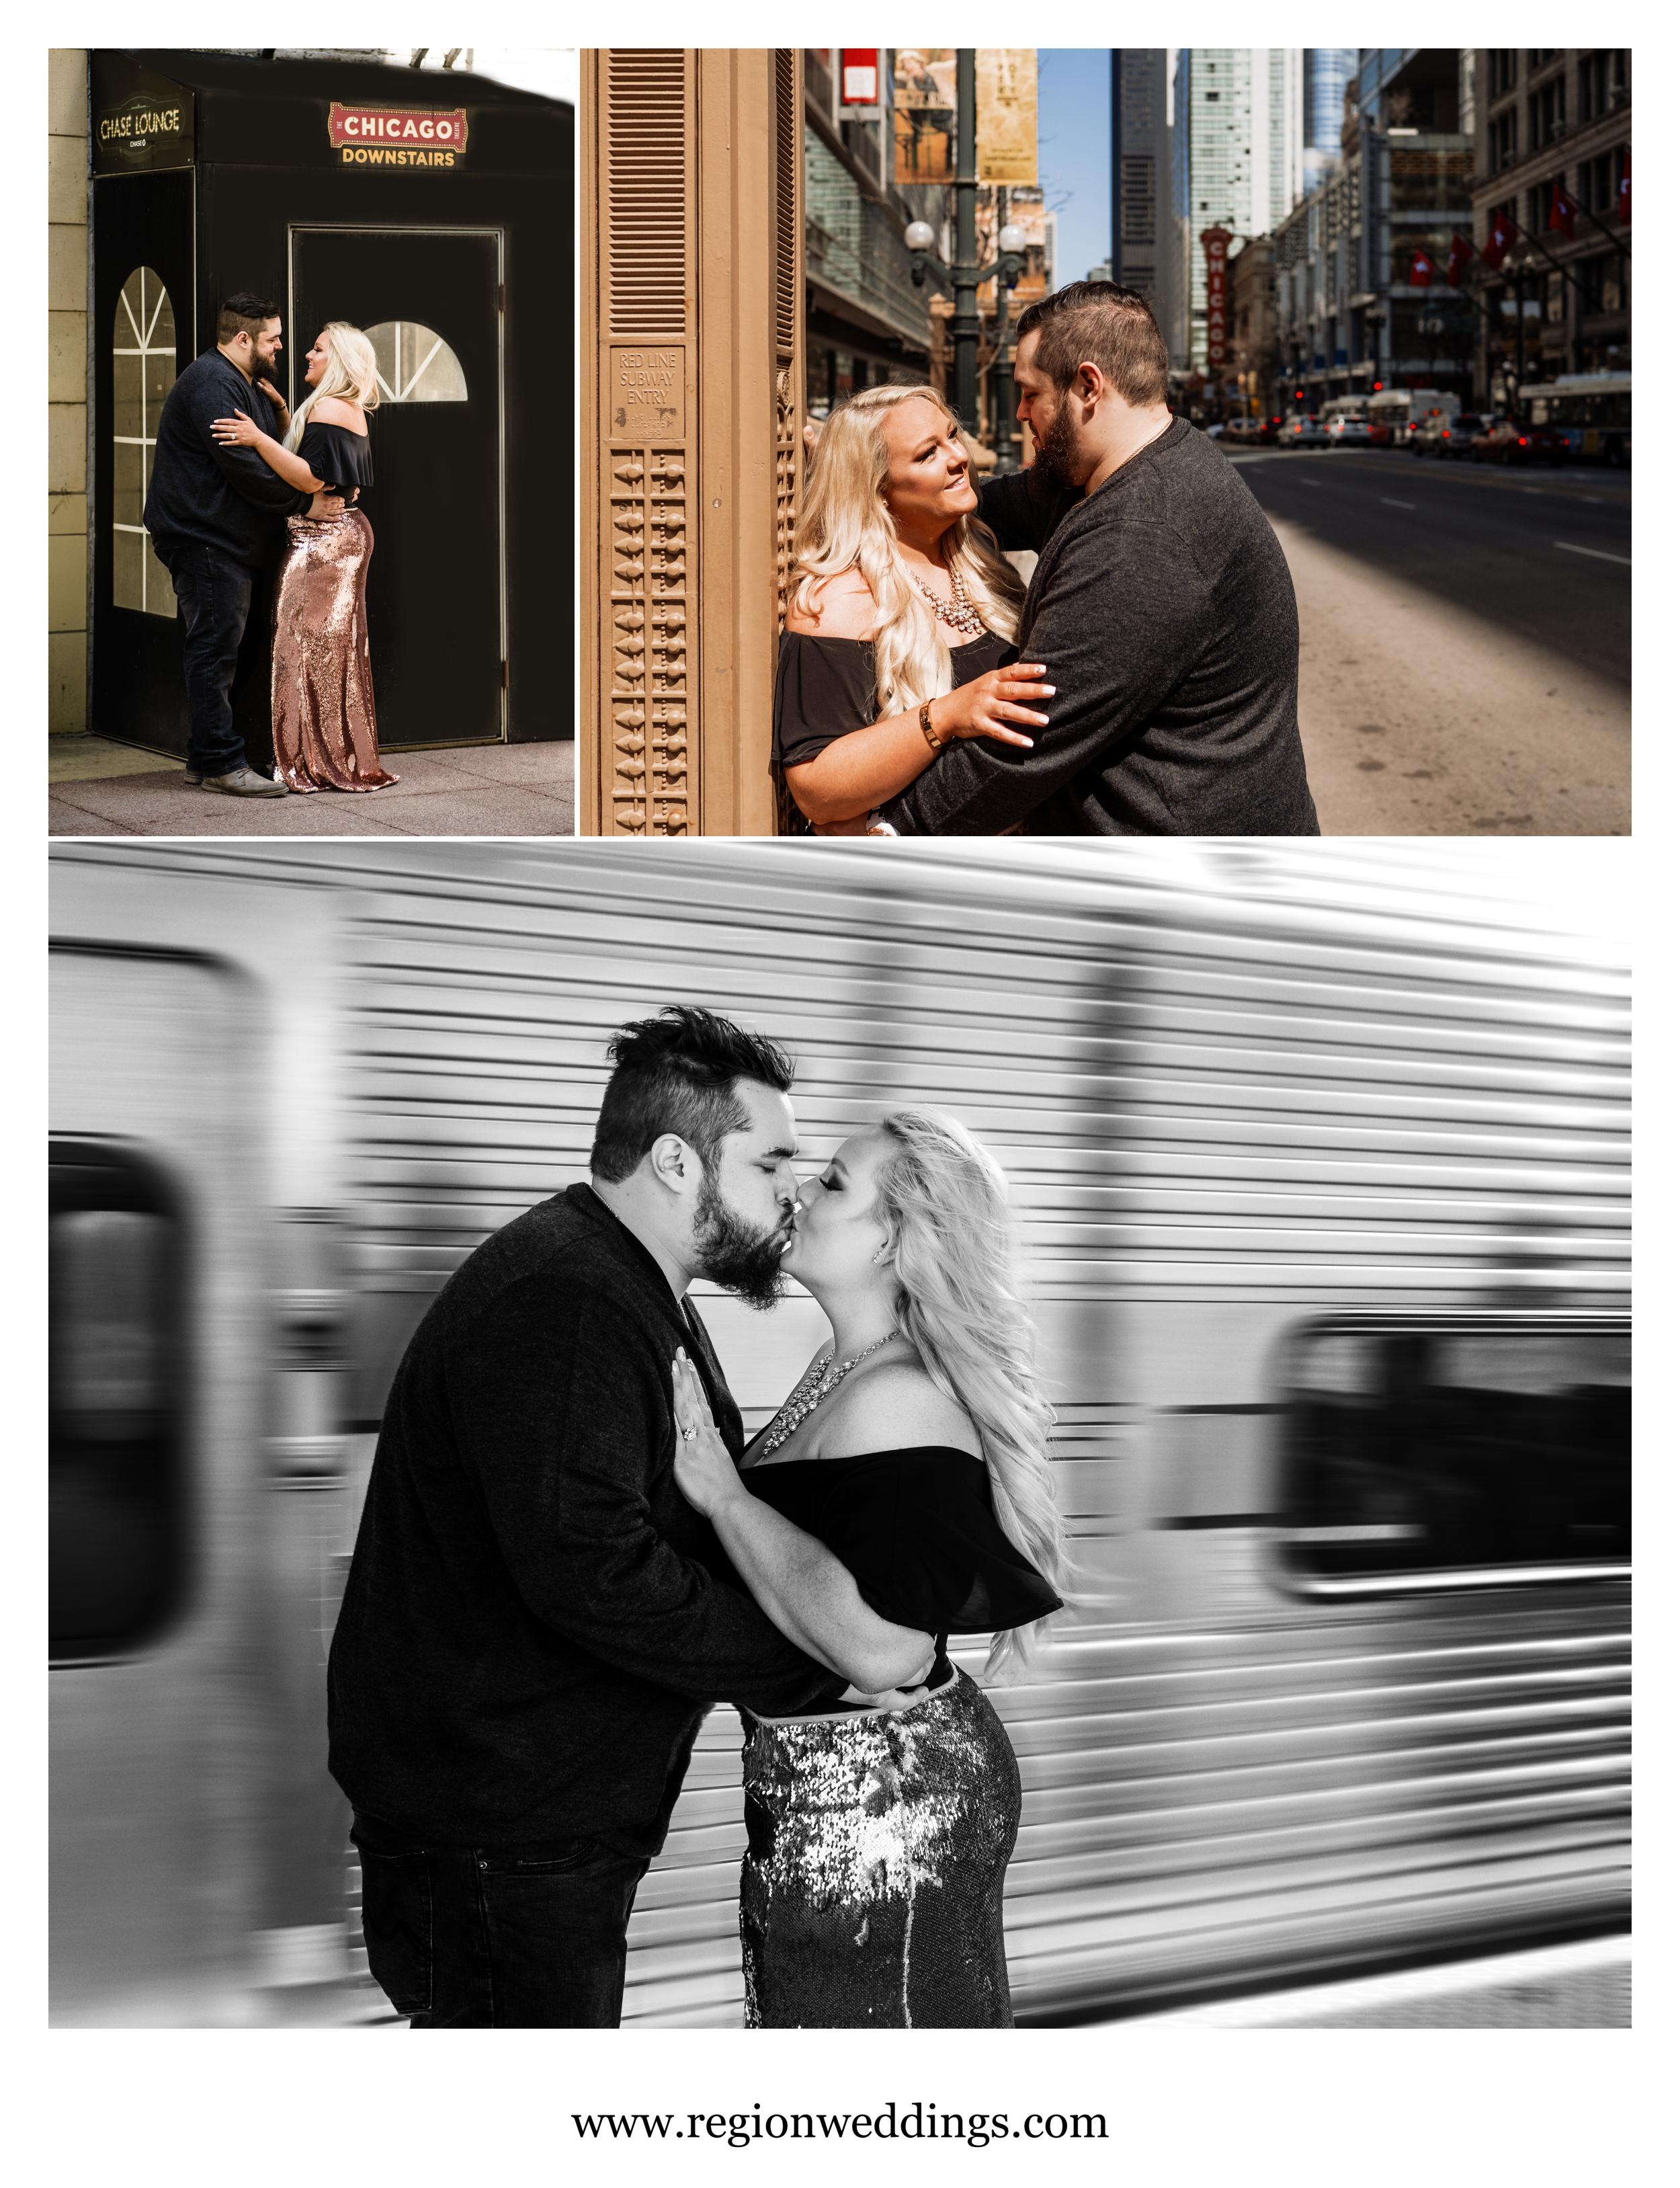 Chicago street engagement photos.